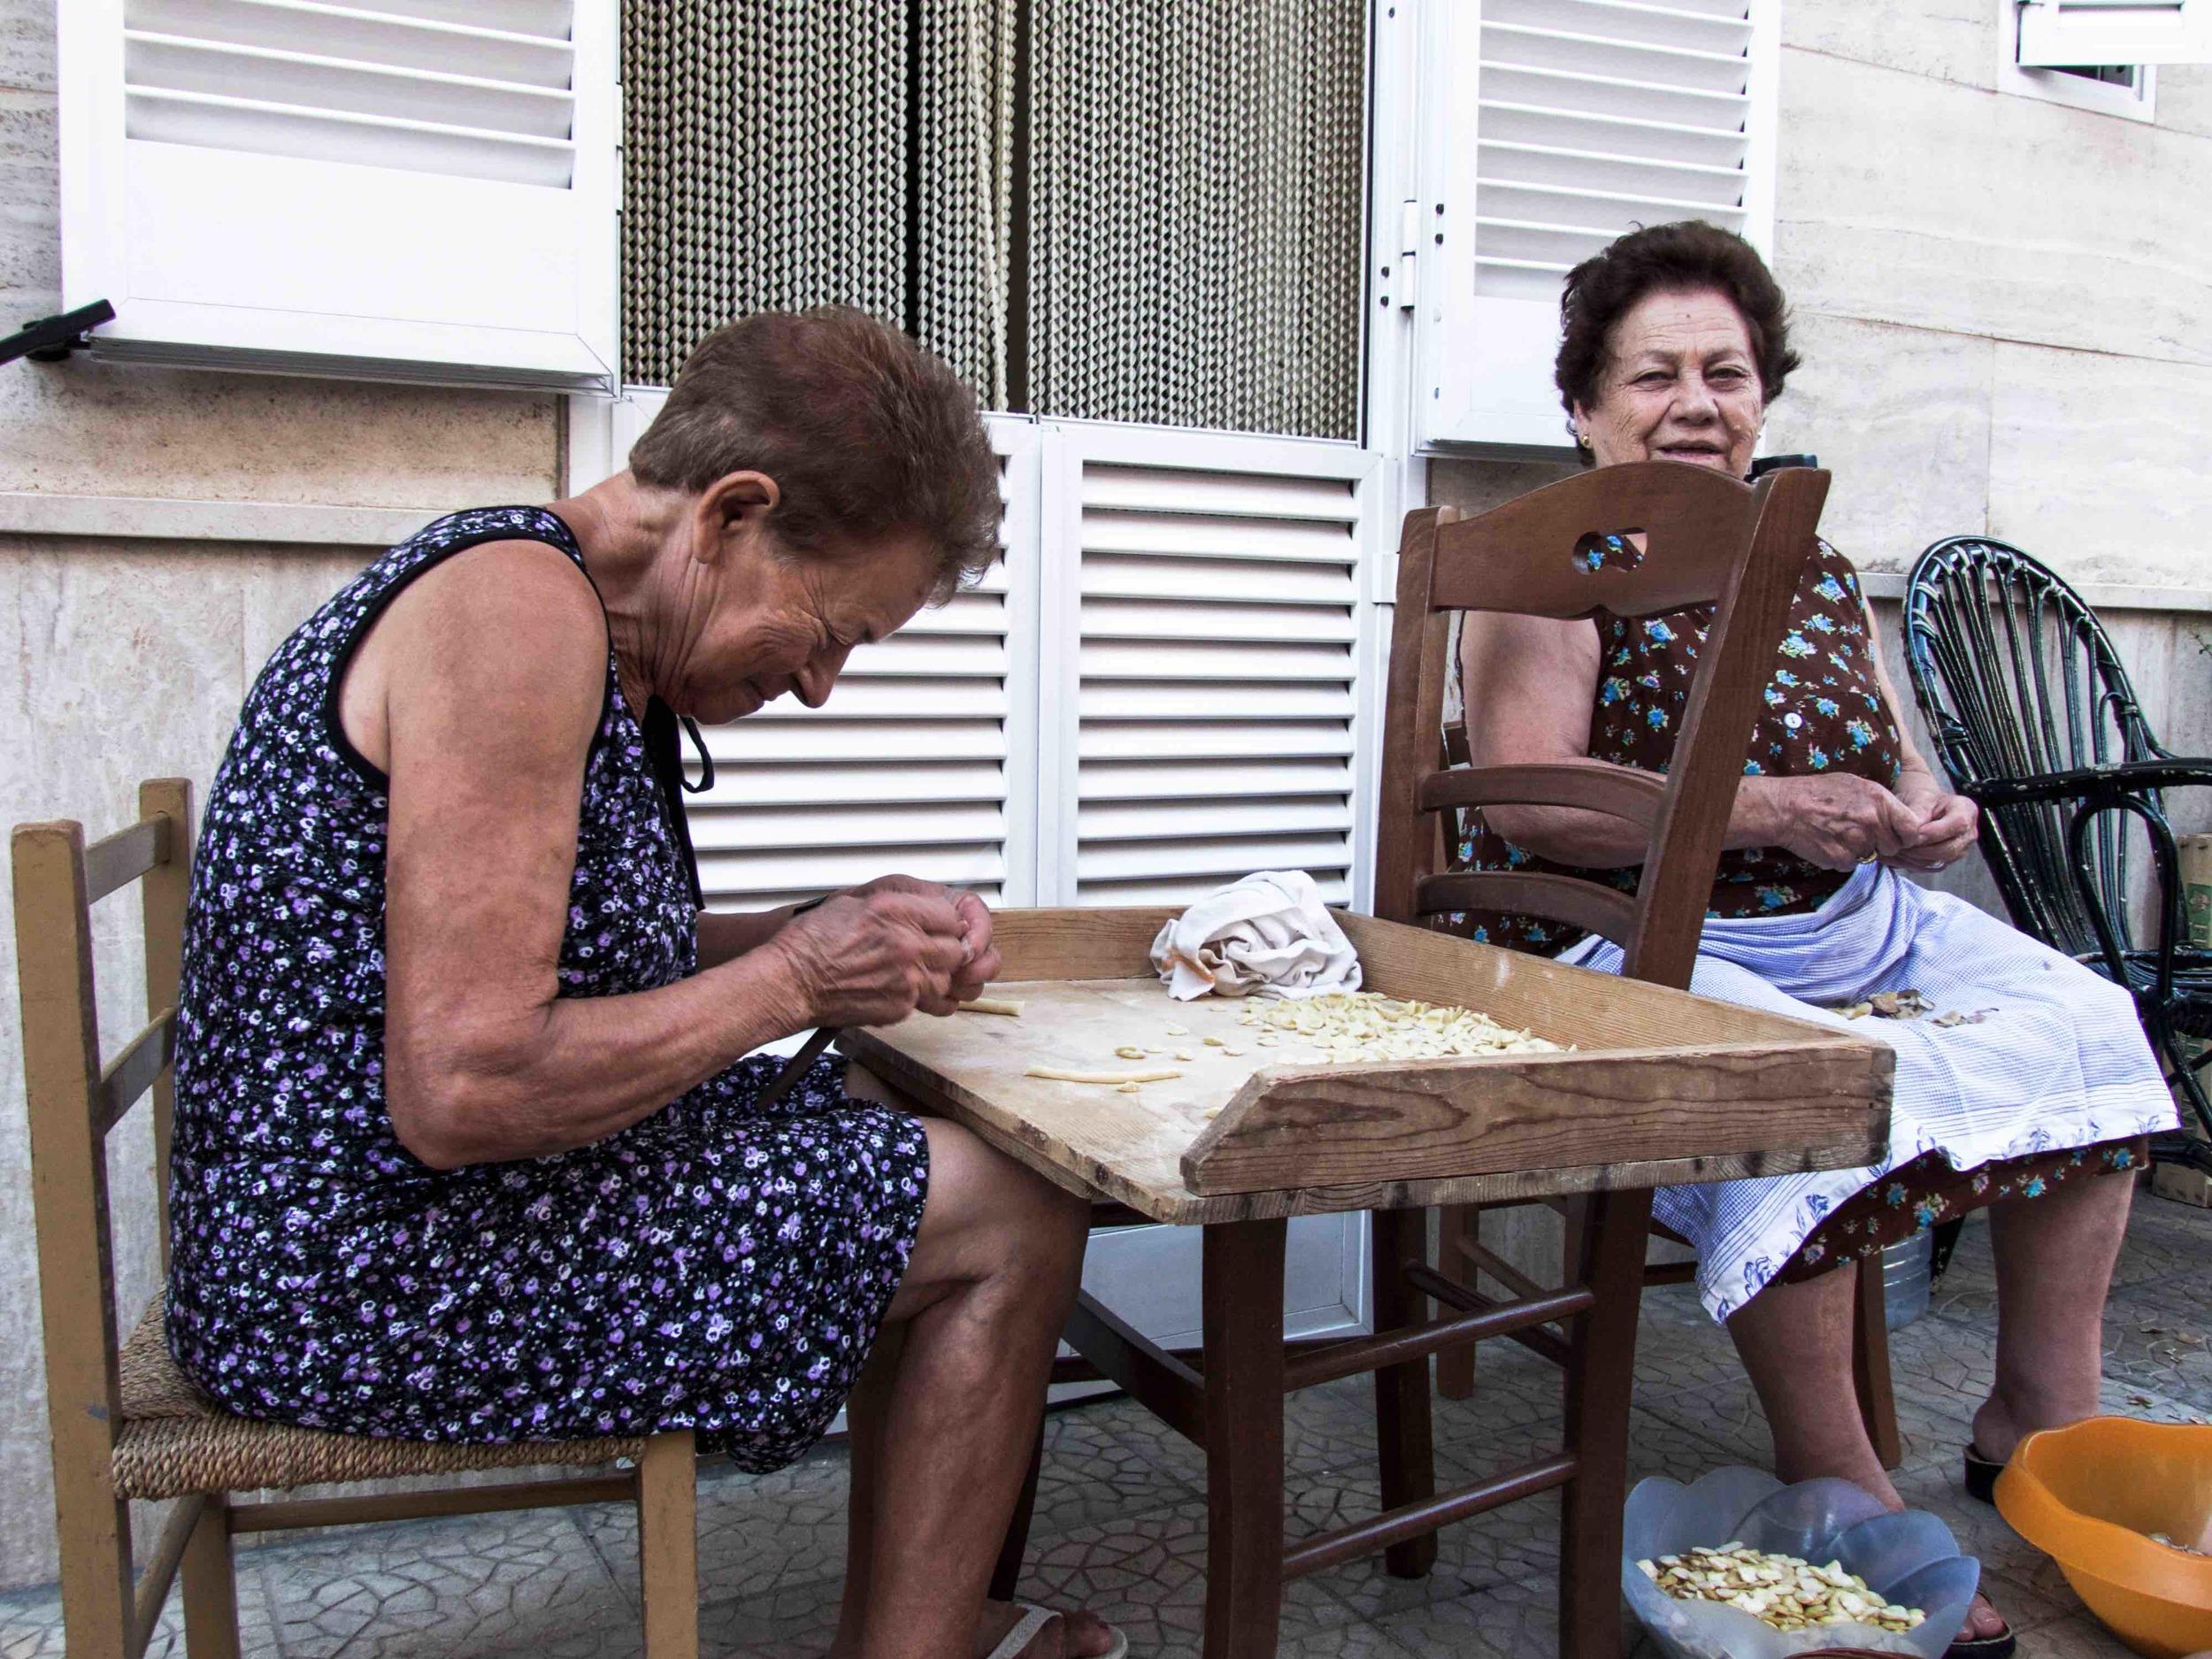 Nonne making children-sized orecchiette for their grandchildren.